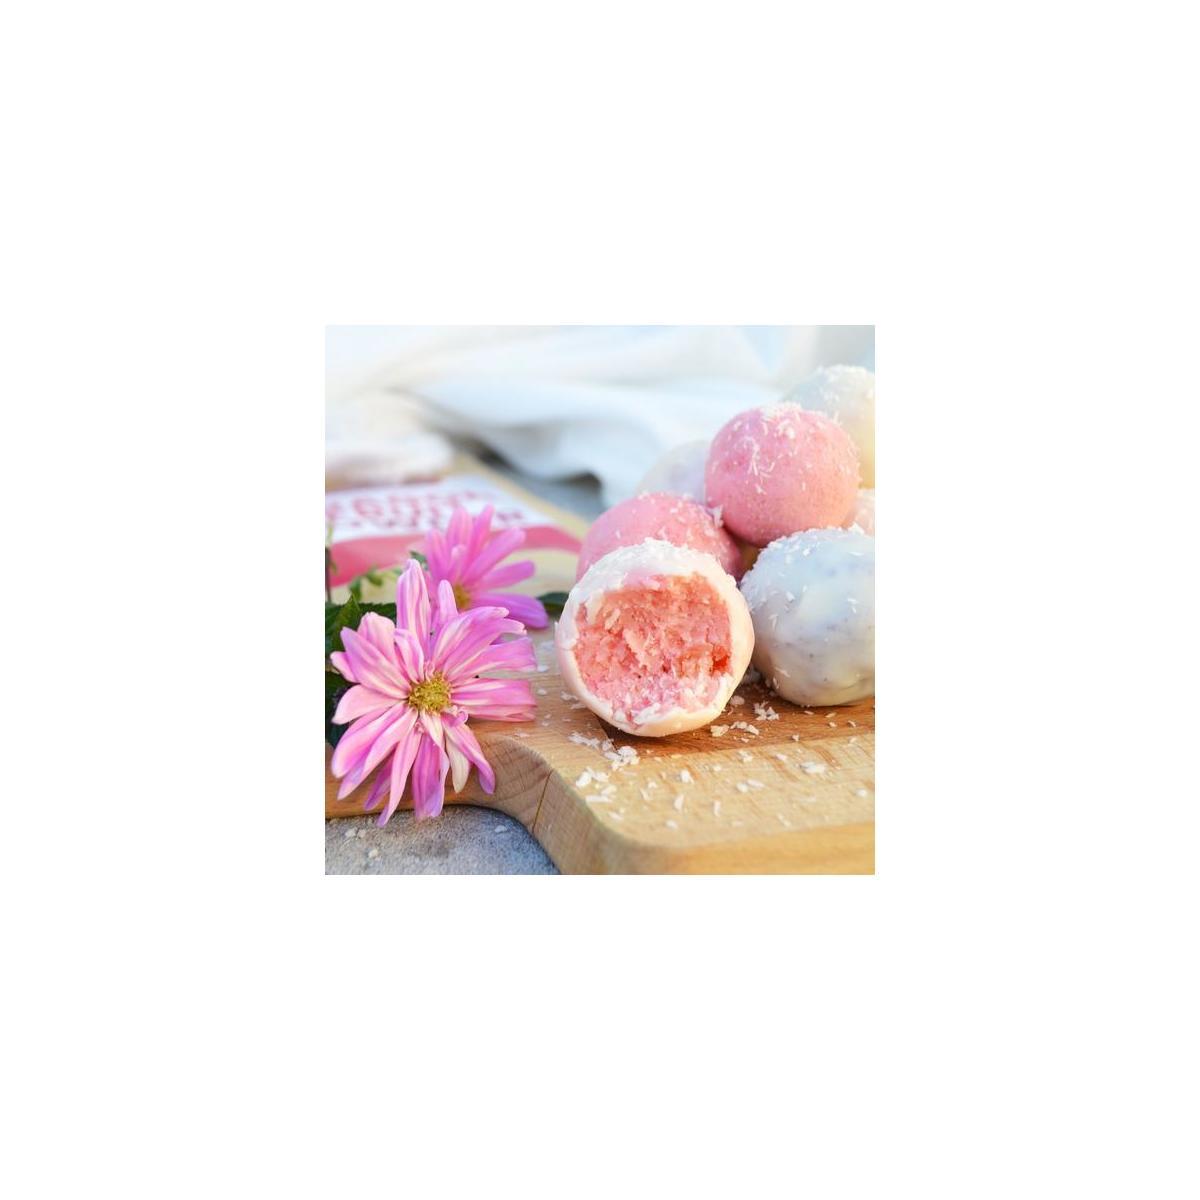 Organic Freeze Dried Dragon Fruit Powder Natural Pink Pitaya Extract